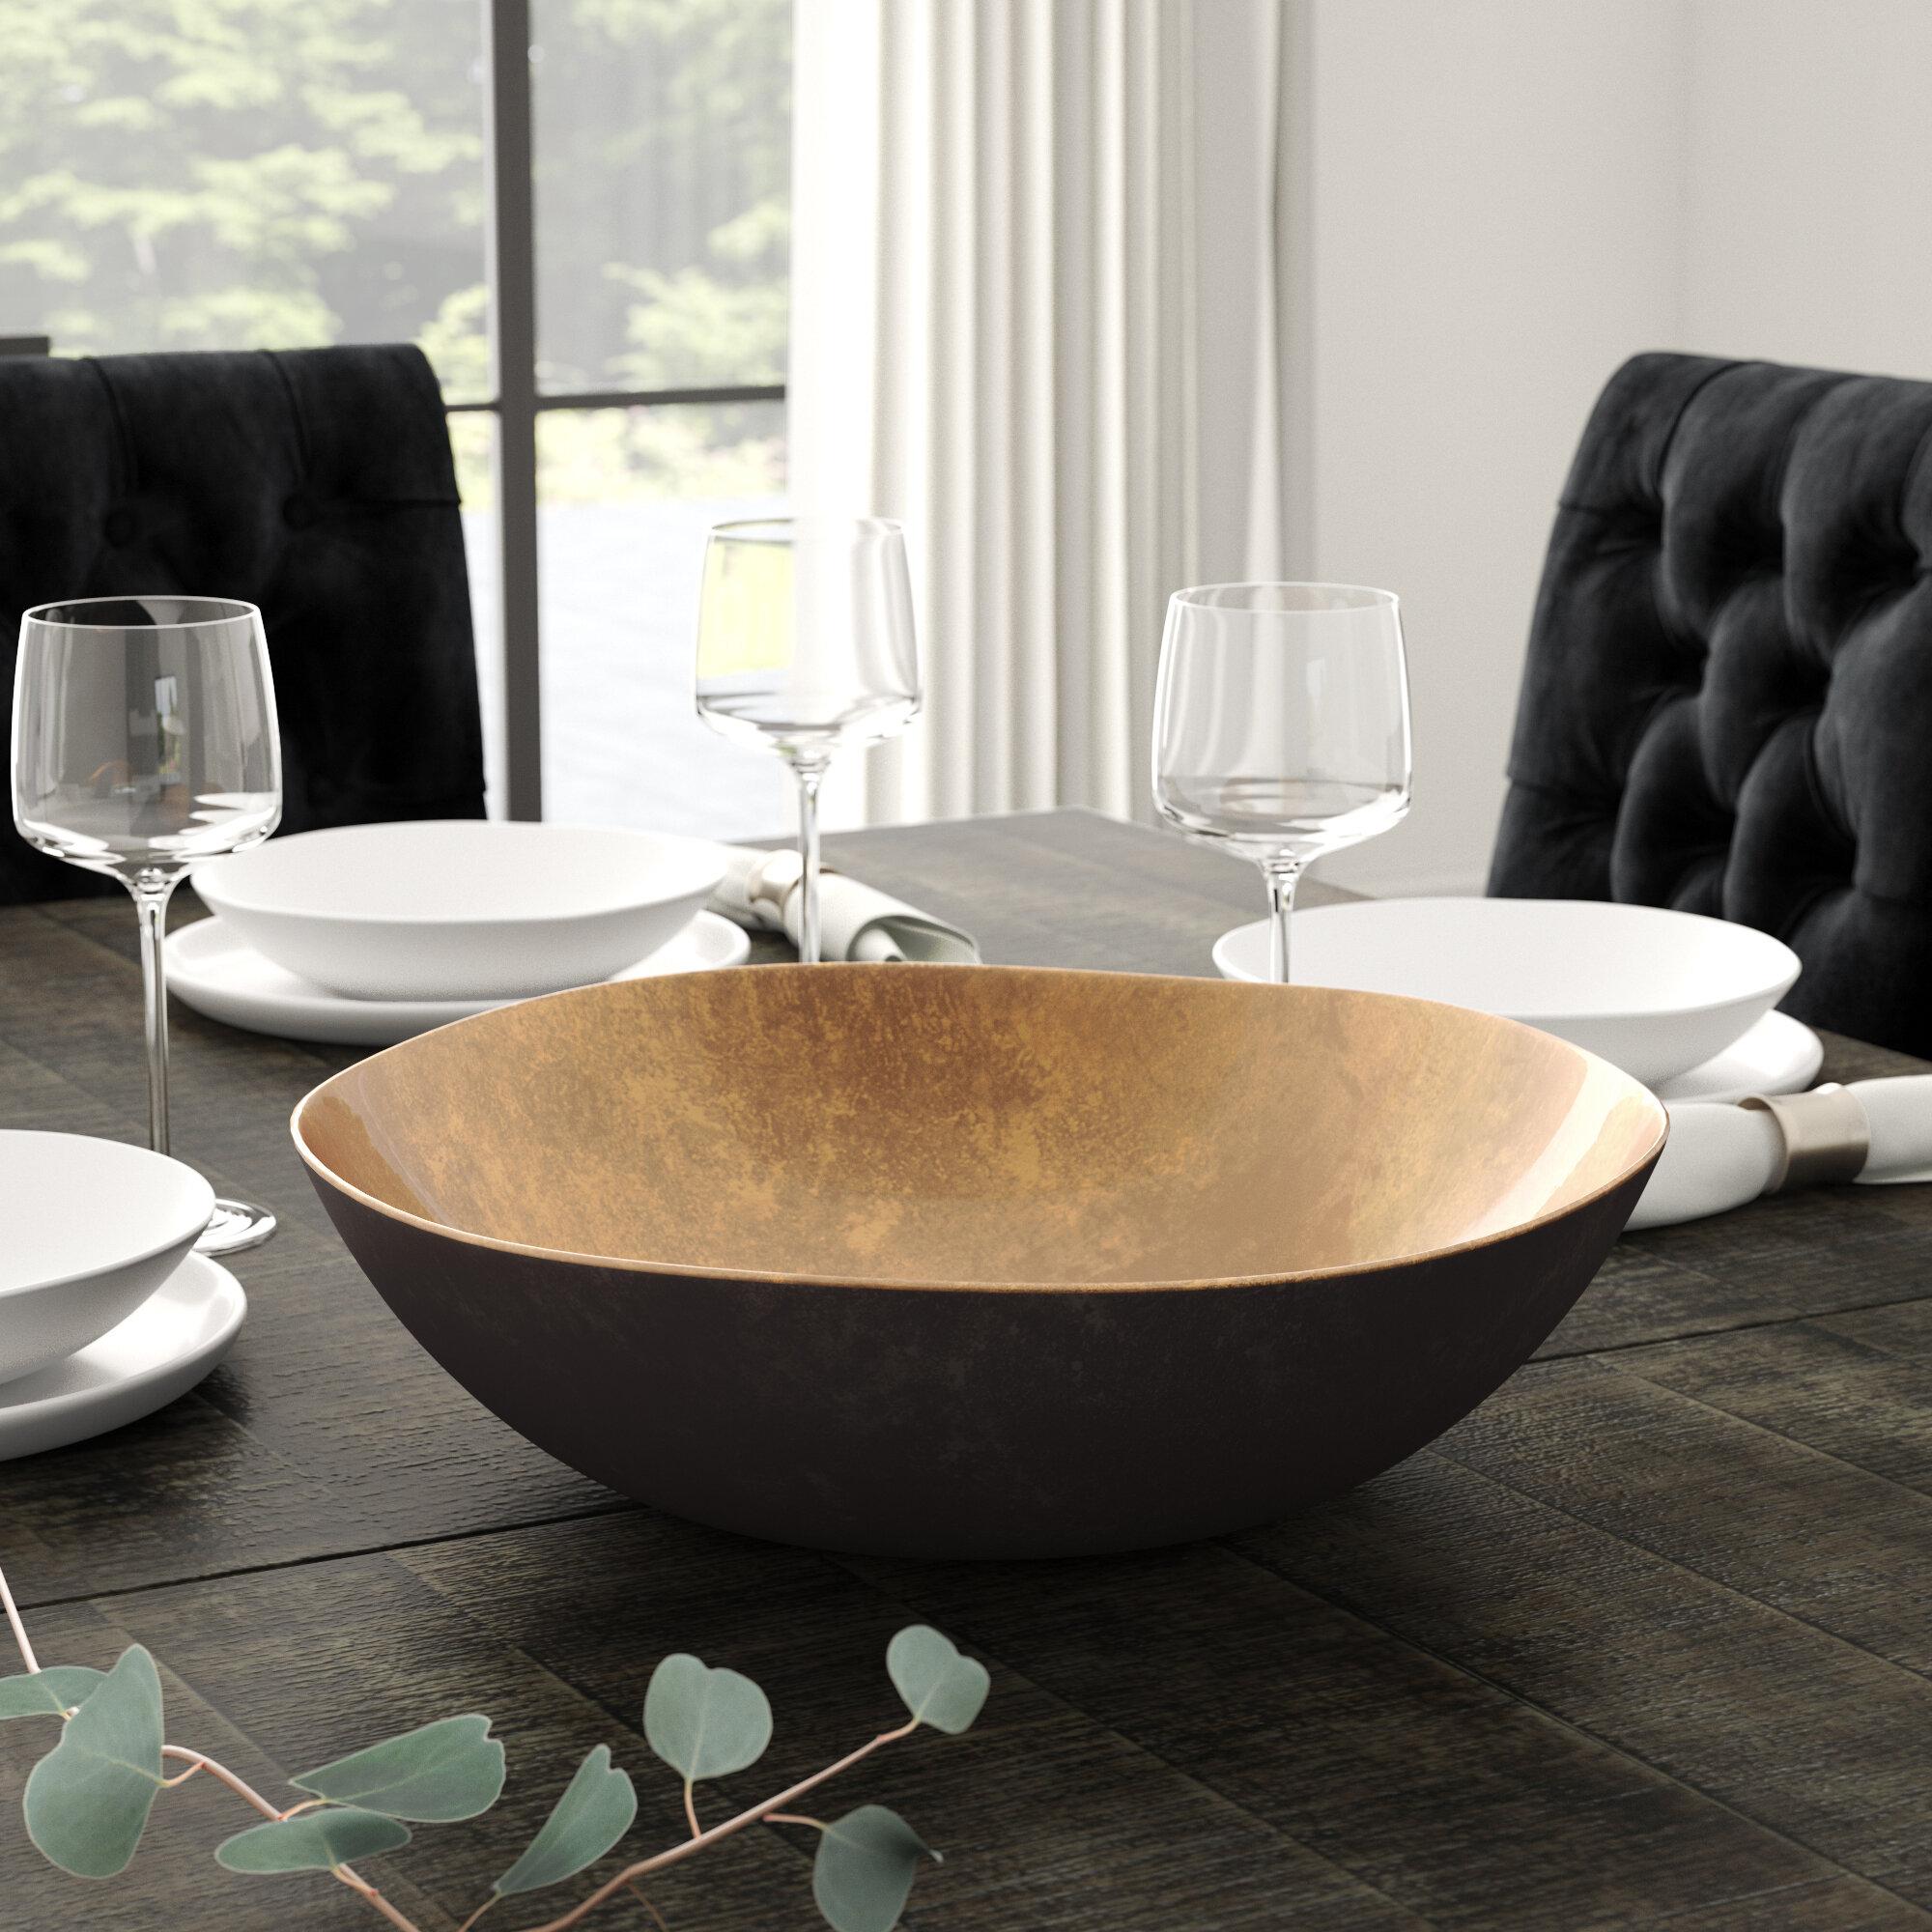 Greyleigh Coleen Large Round Decorative Bowl Reviews Wayfair